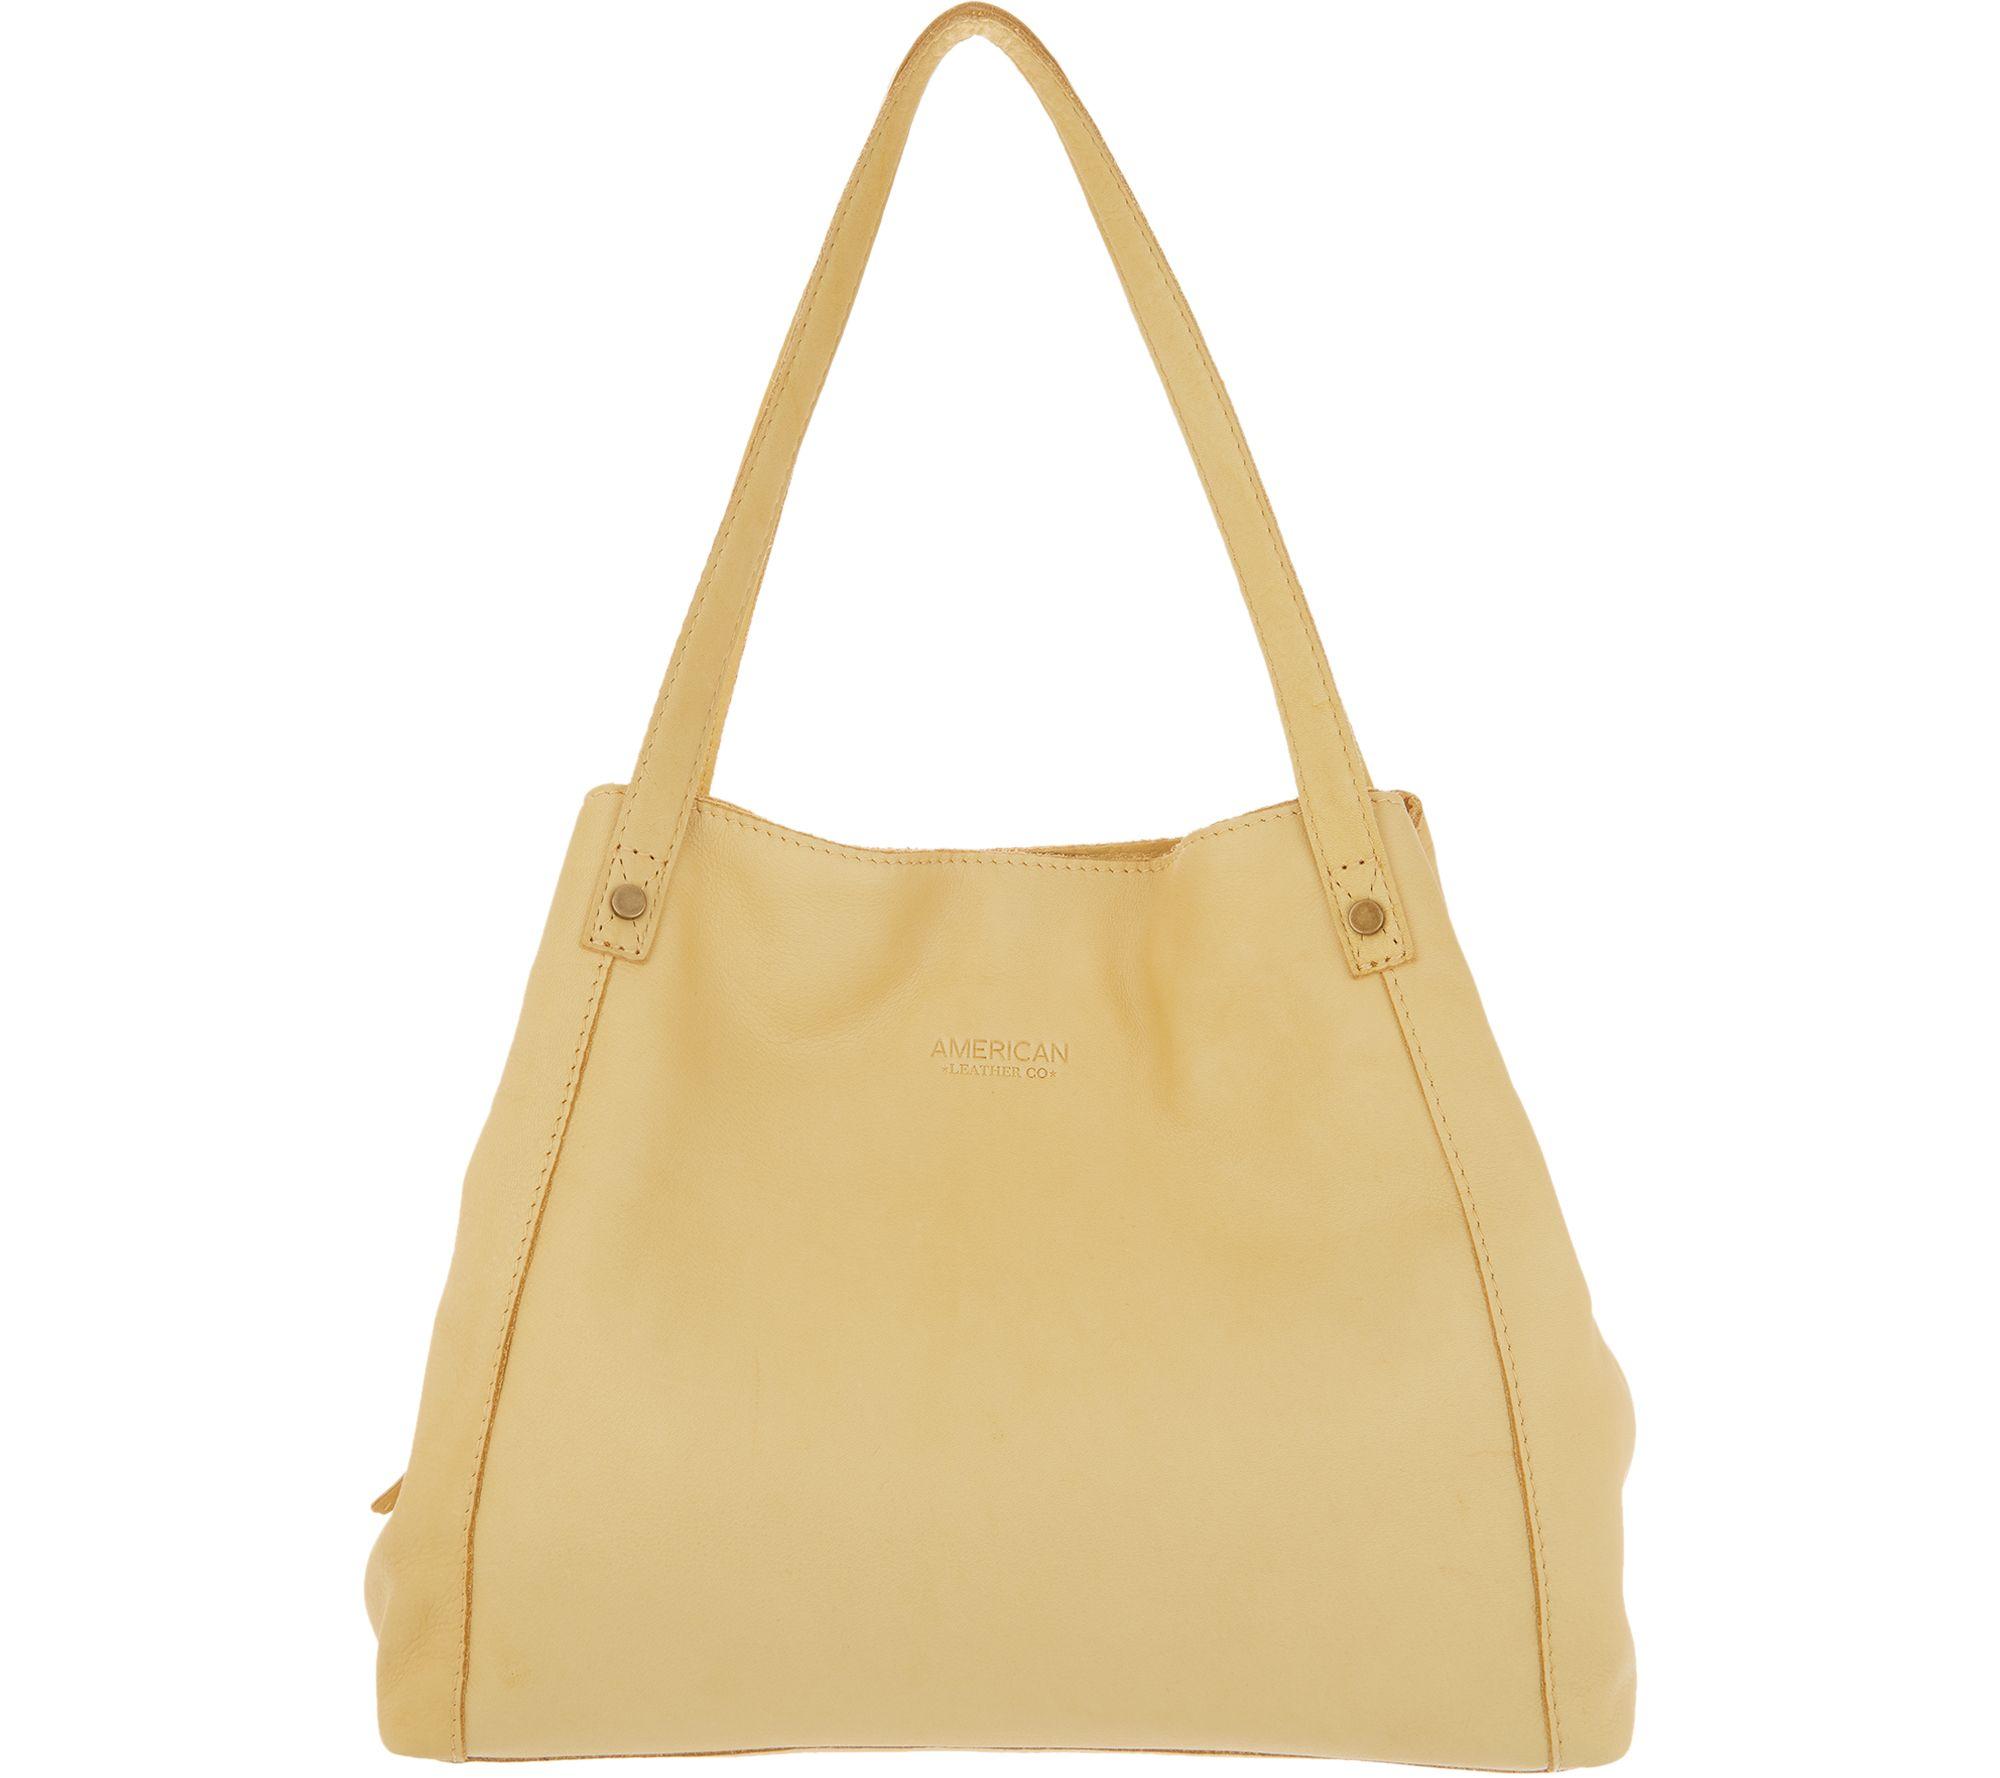 f3d249c941 American Leather Co. Glove Leather Shopper Handbag - Liberty - Page 1 —  QVC.com